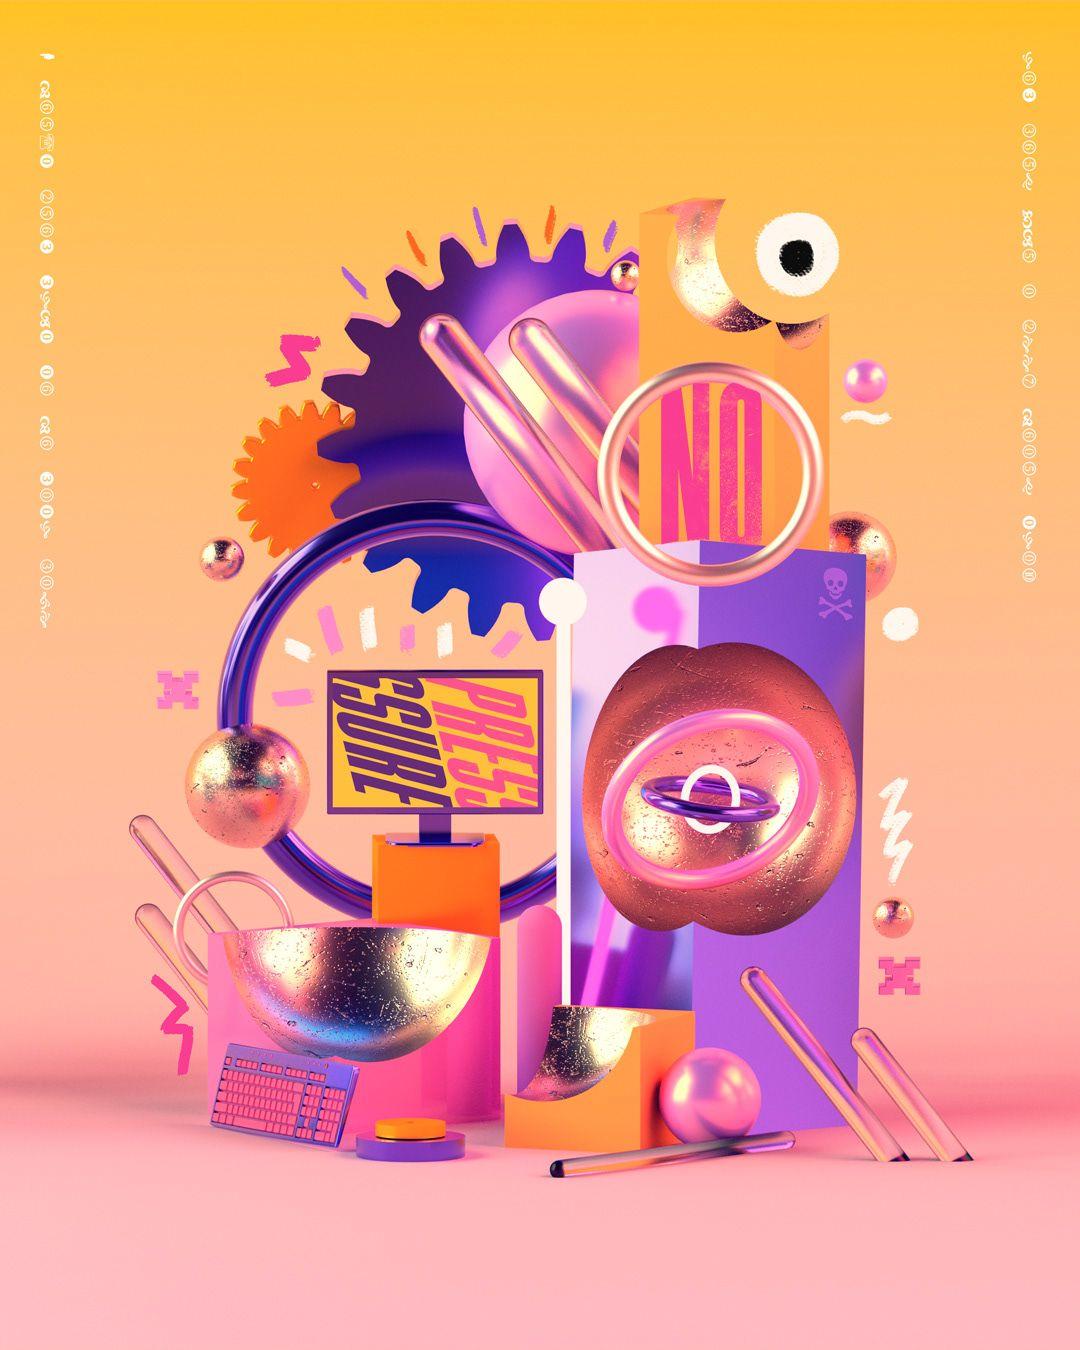 2018 Illustrations - Vol 1 on Behance